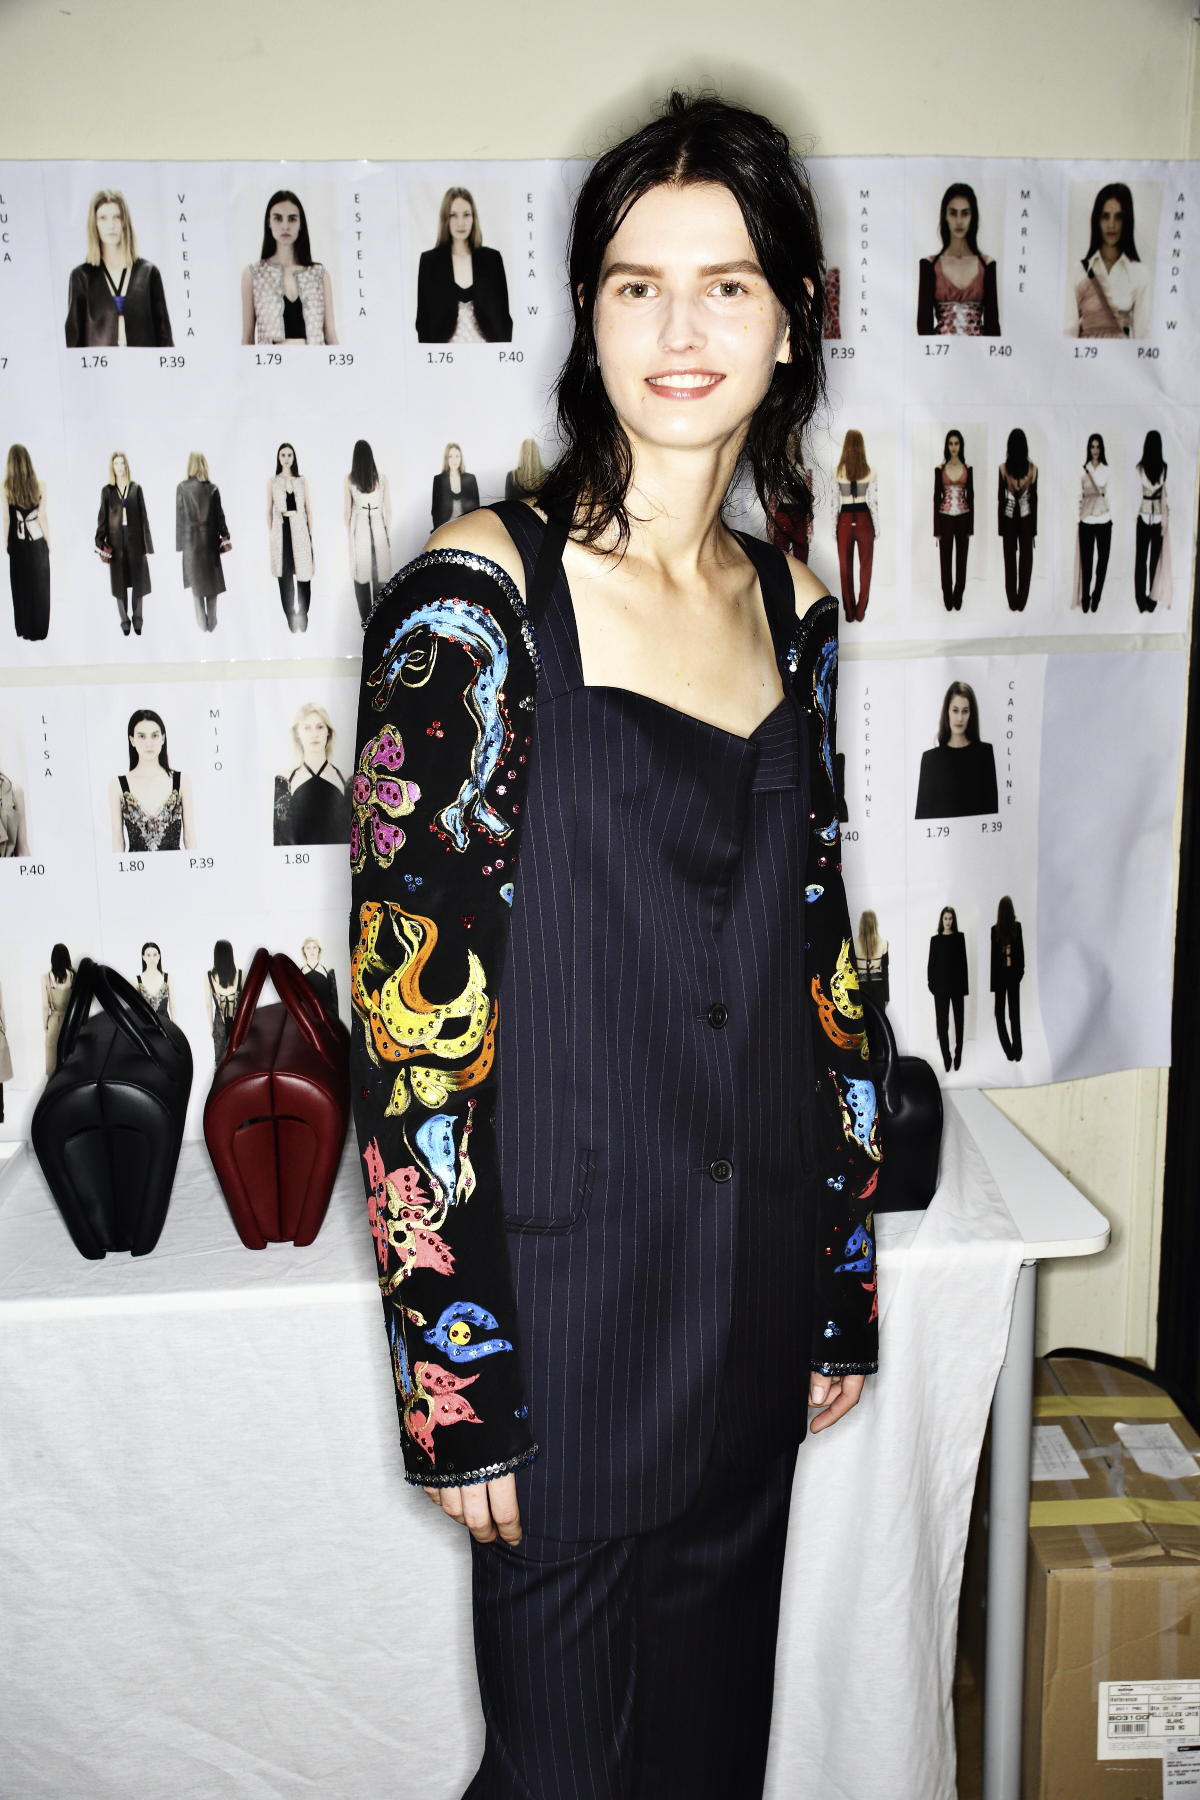 b62756577ae Sonny Vandevelde - Maison Martin Margiela SS14 Fashion Show Paris ...